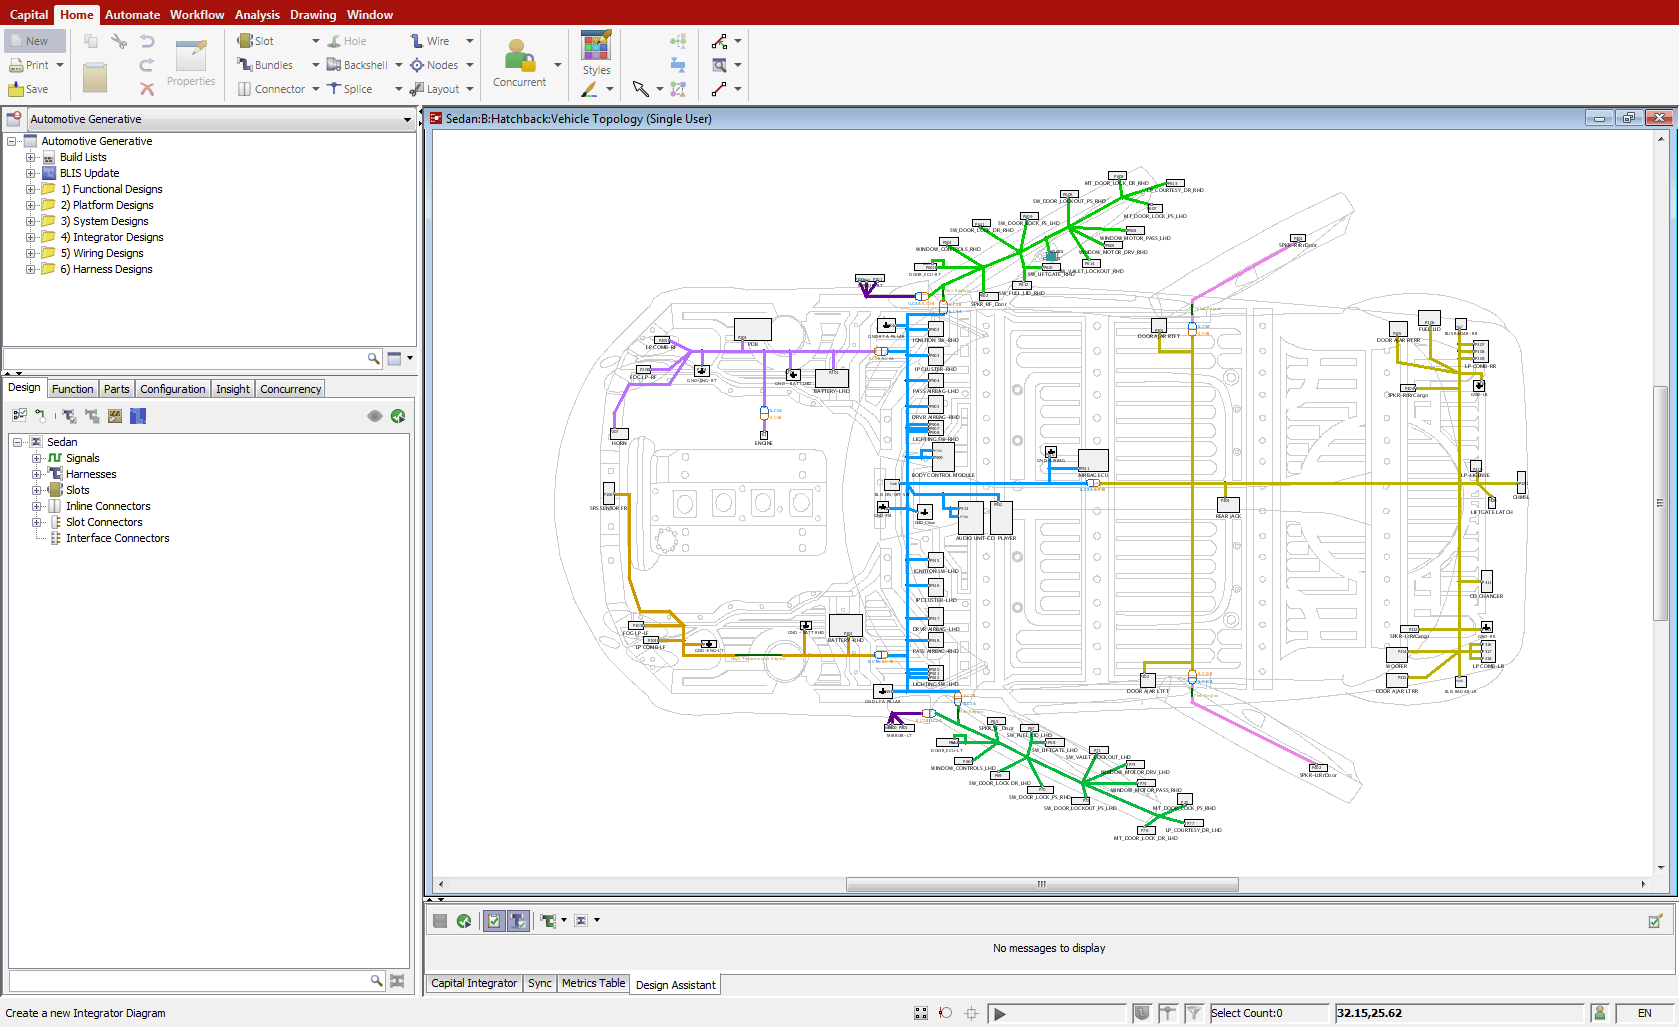 small resolution of capital integrator